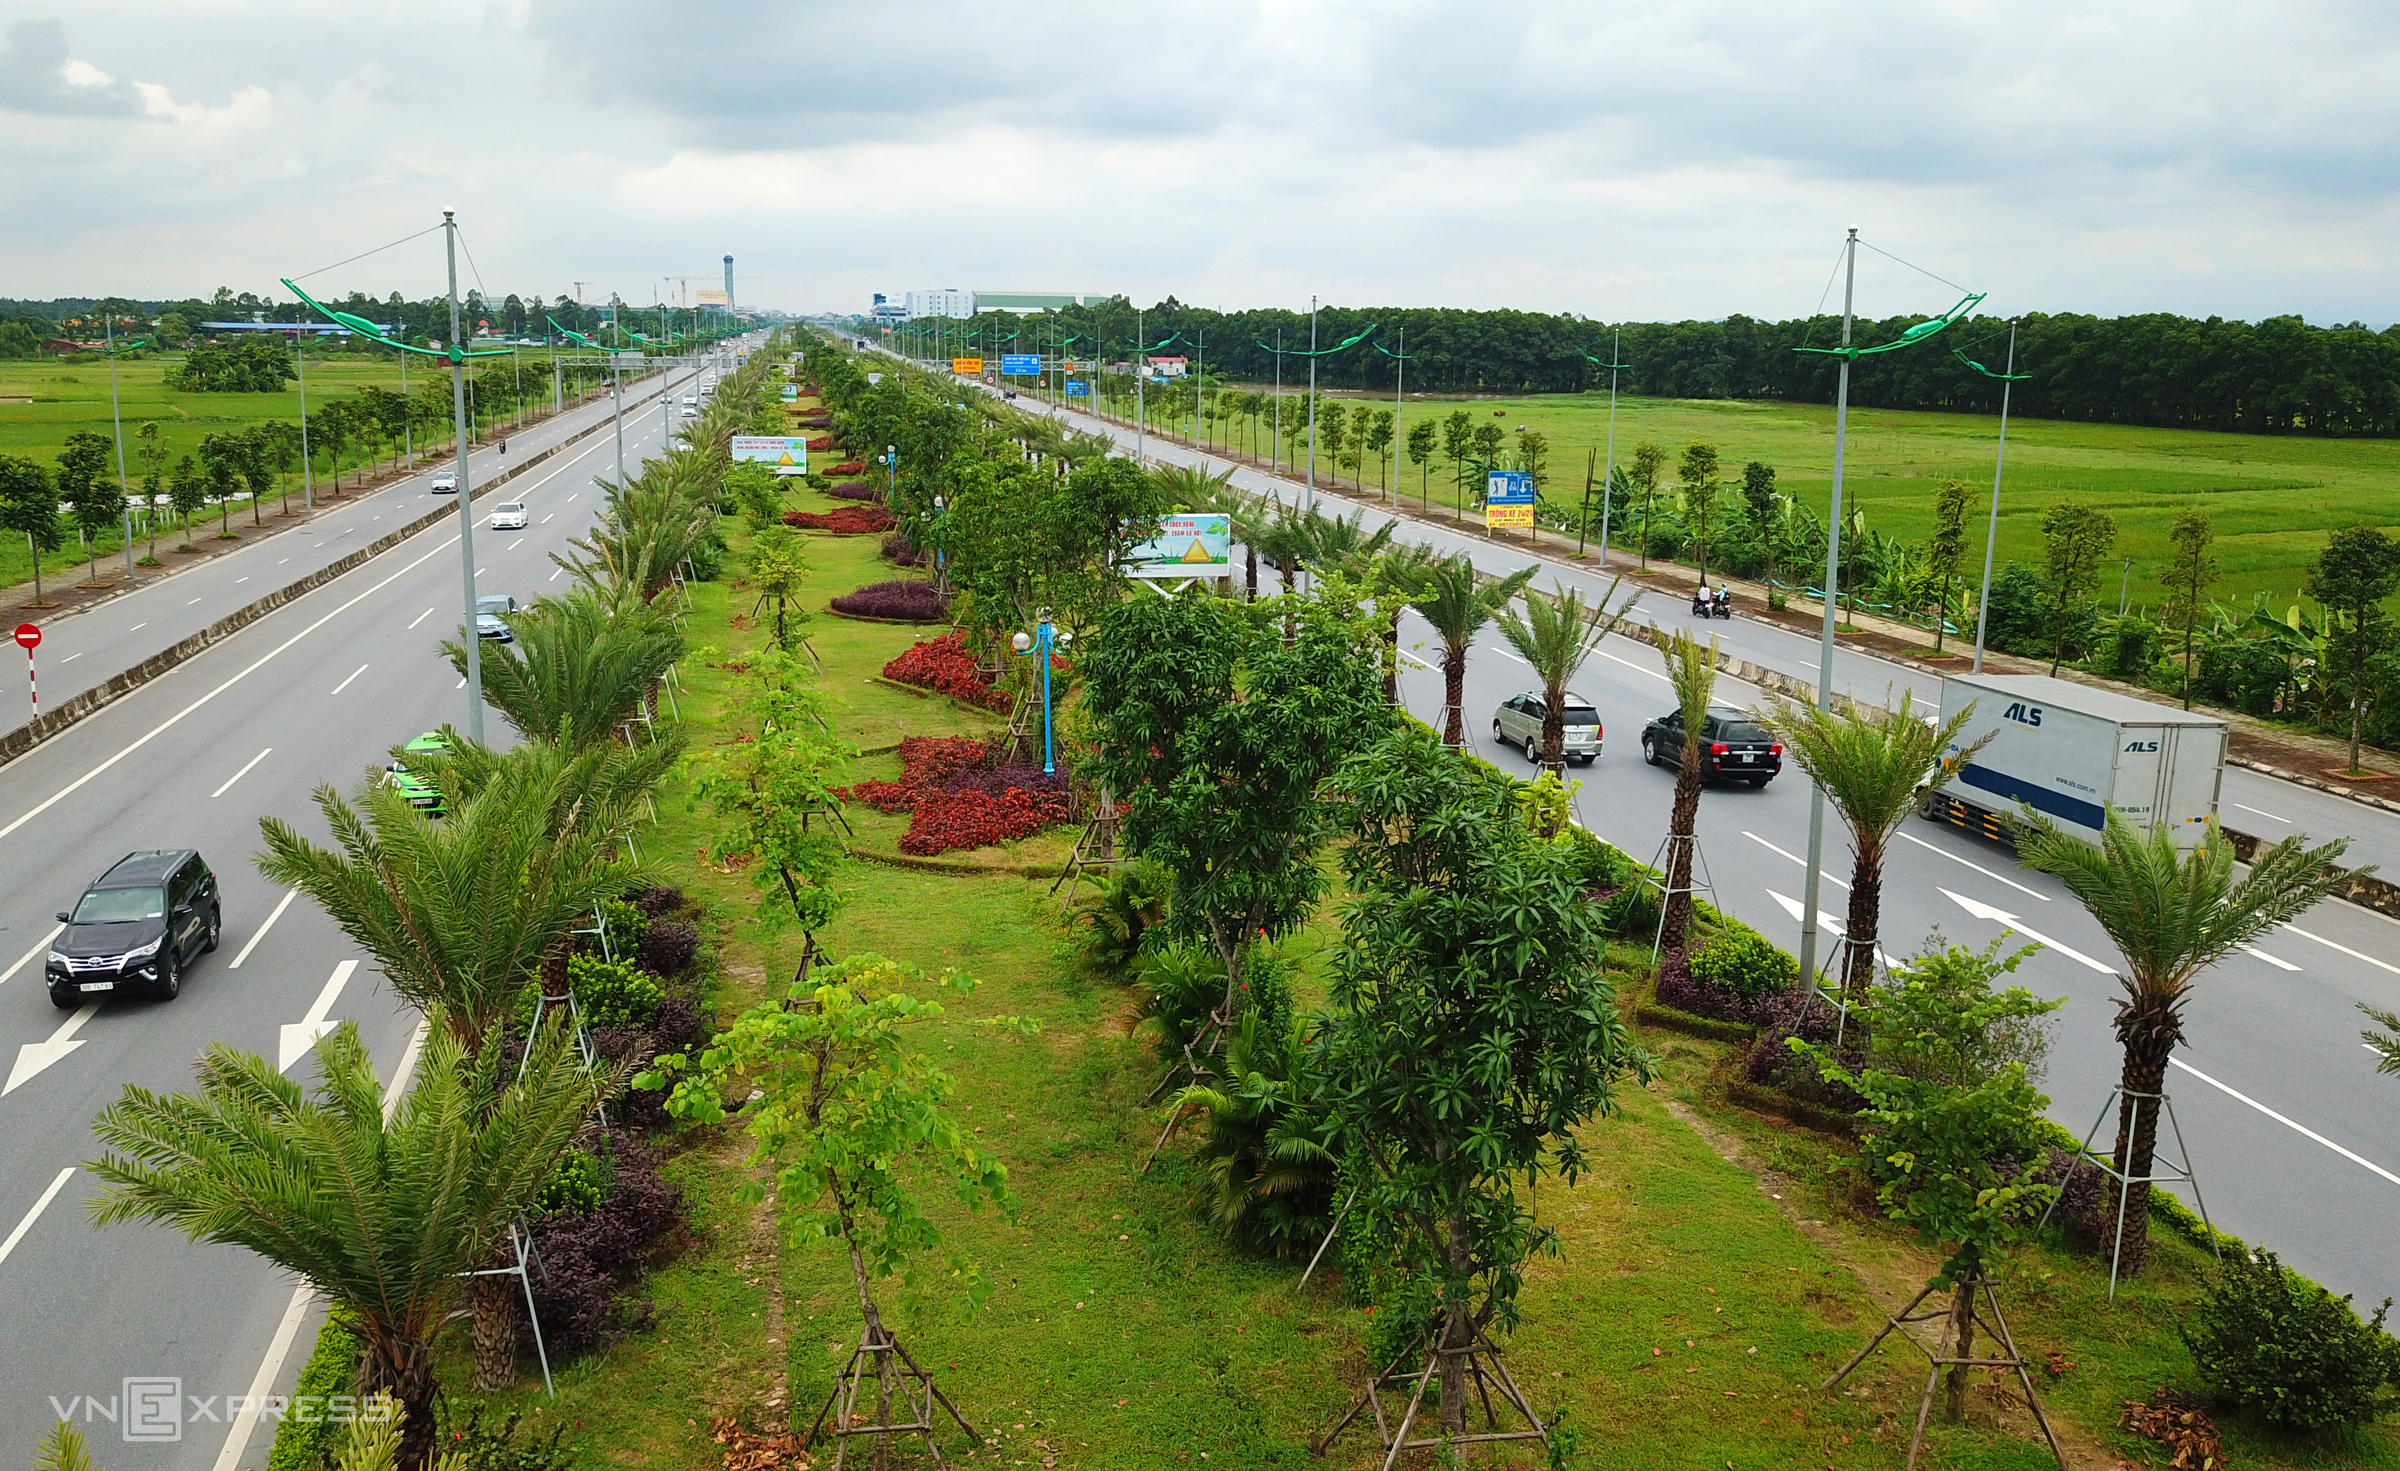 Hanoi streets turn verdant after tree planting program success